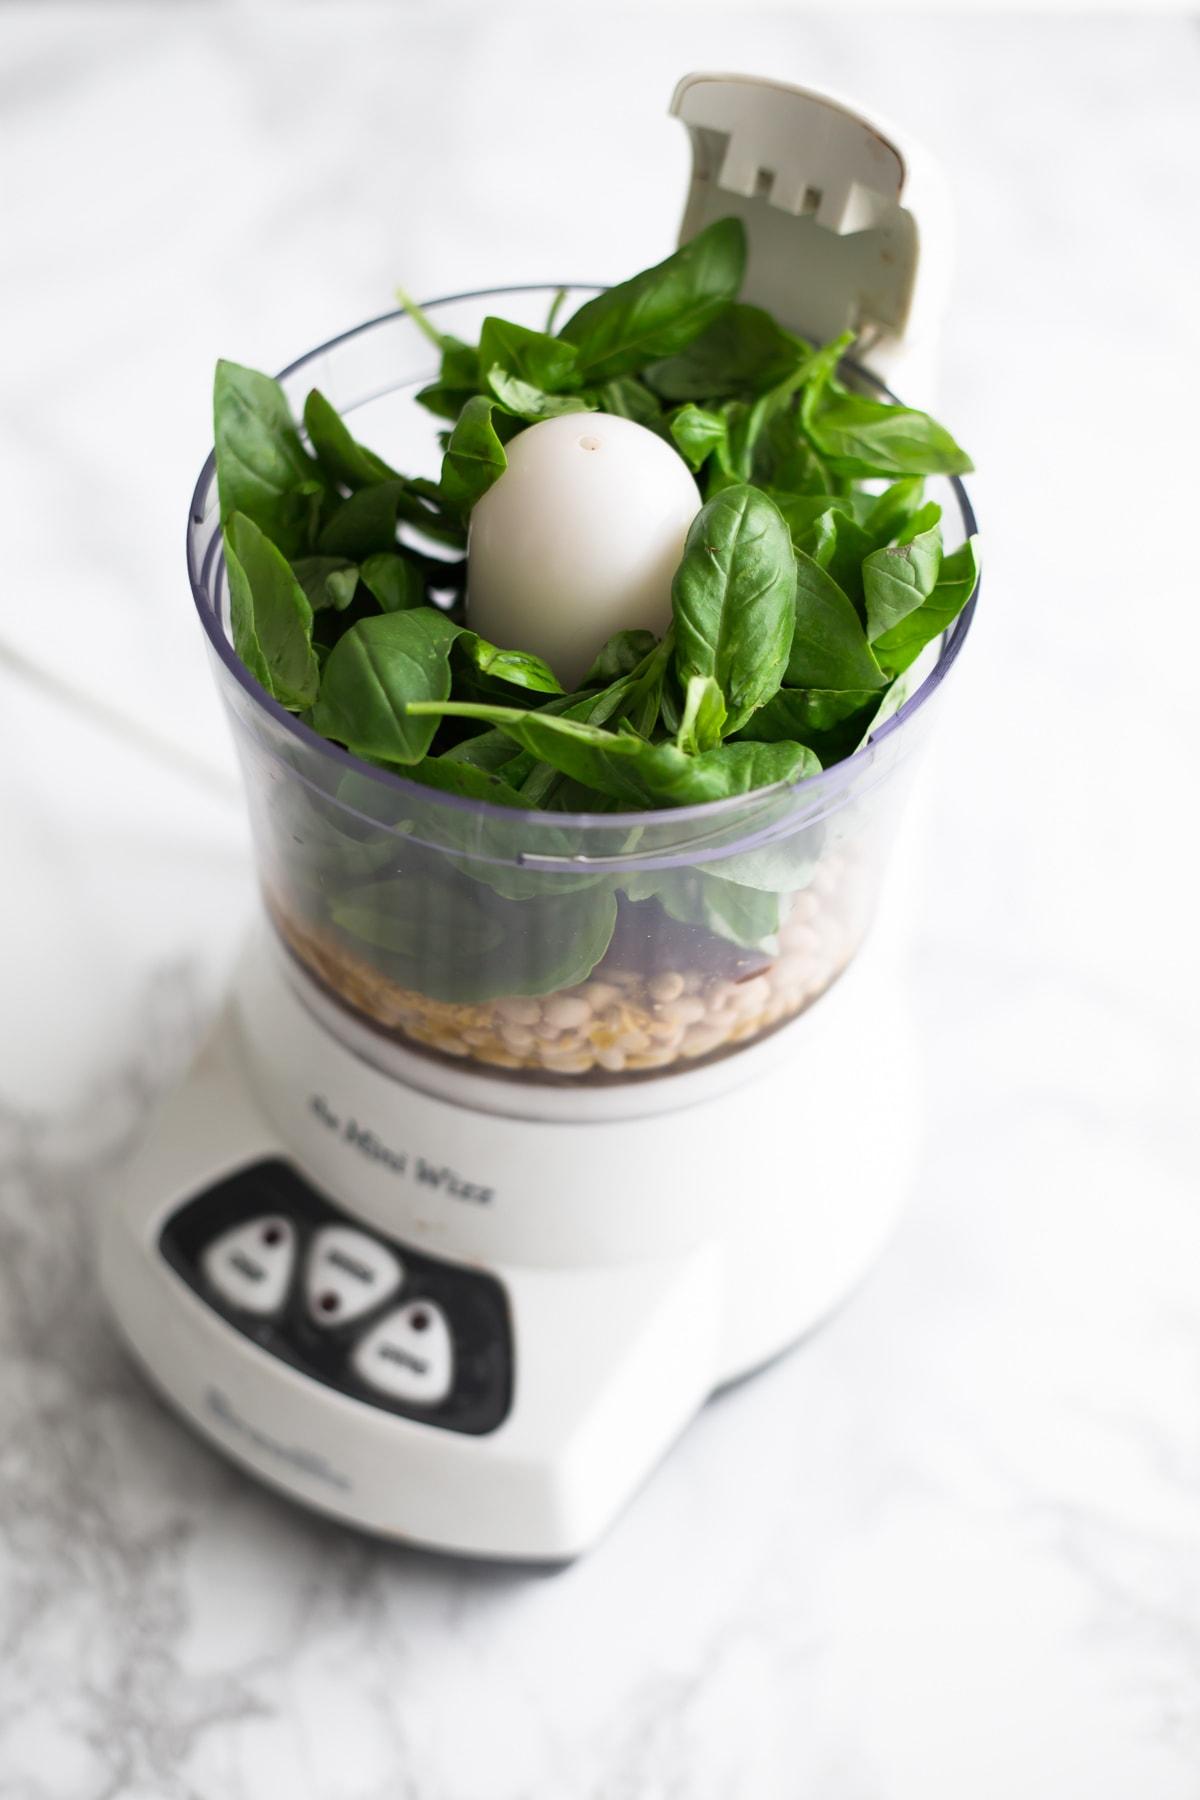 Vegan Pesto Aioli Recipe With Aquafaba Mayonnaise Simple Healthy Delicious #aioli #aquafaba #mayonnaise #vegan #pesto #dairyfree #simple #chickpea #cheap #easy #basil #pinenuts